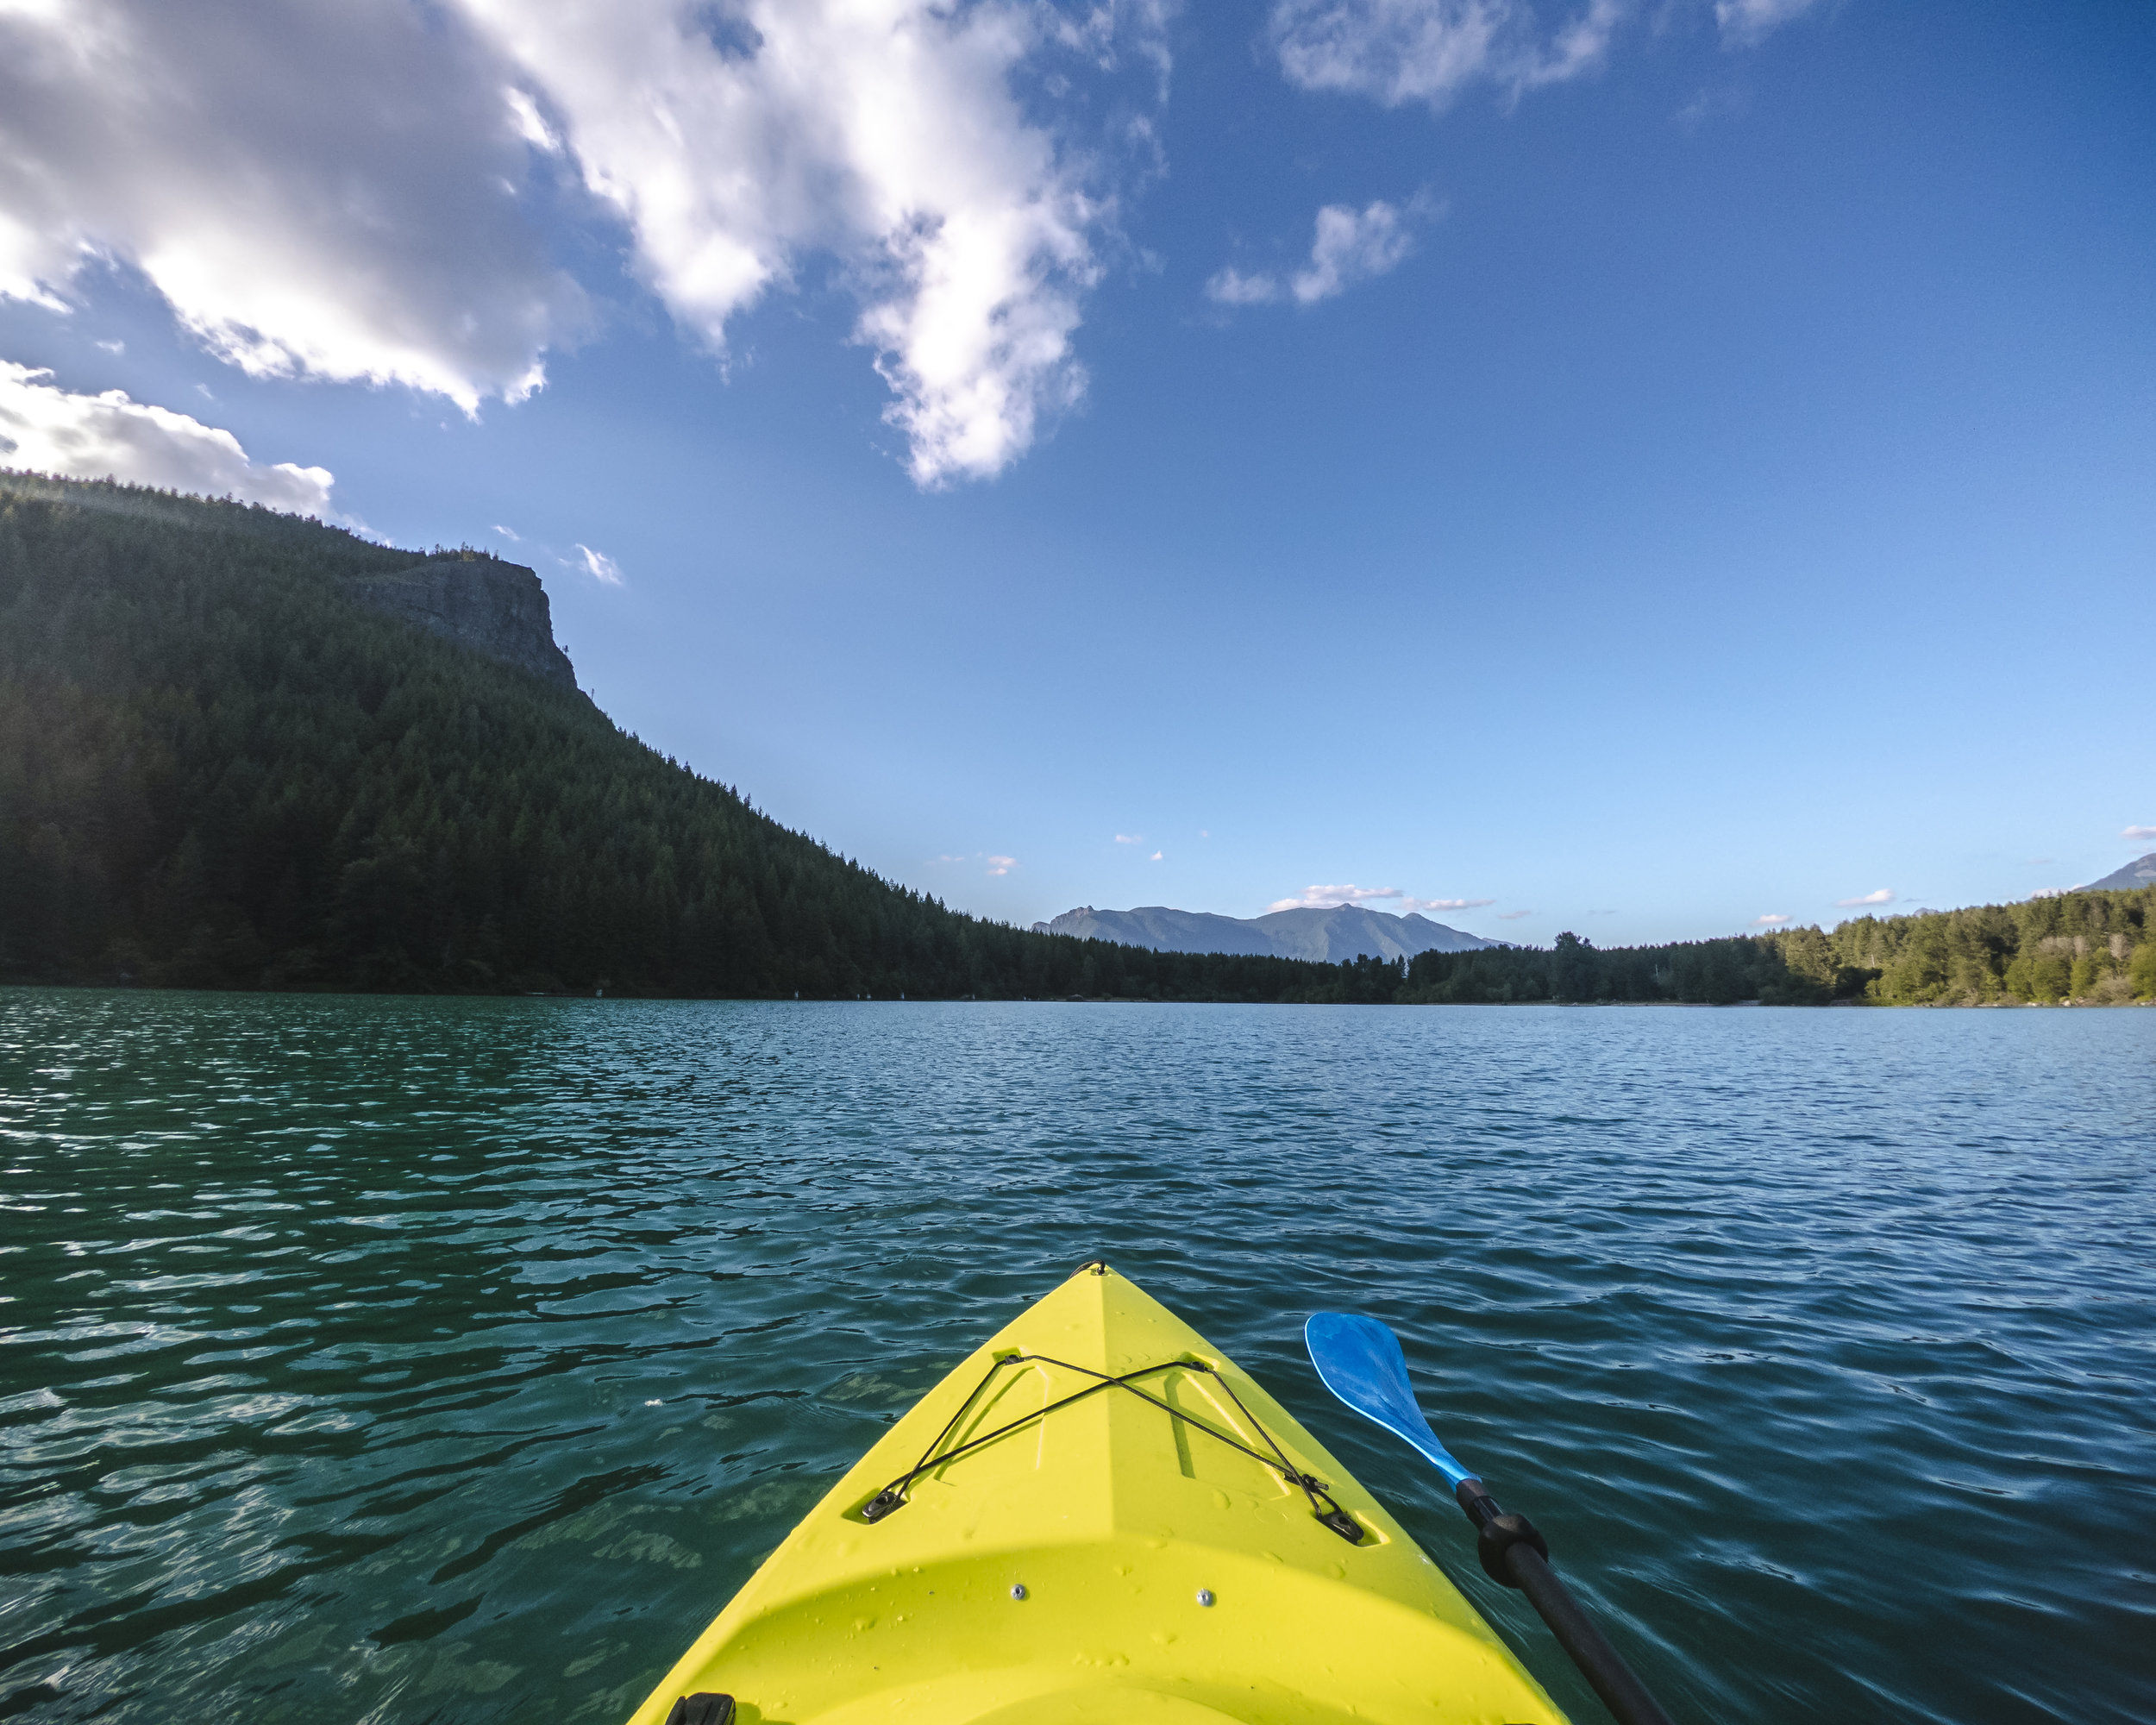 Kayak_Boat_Point_of_View_on_Turquoise_Mountain_Lake_Water.jpg